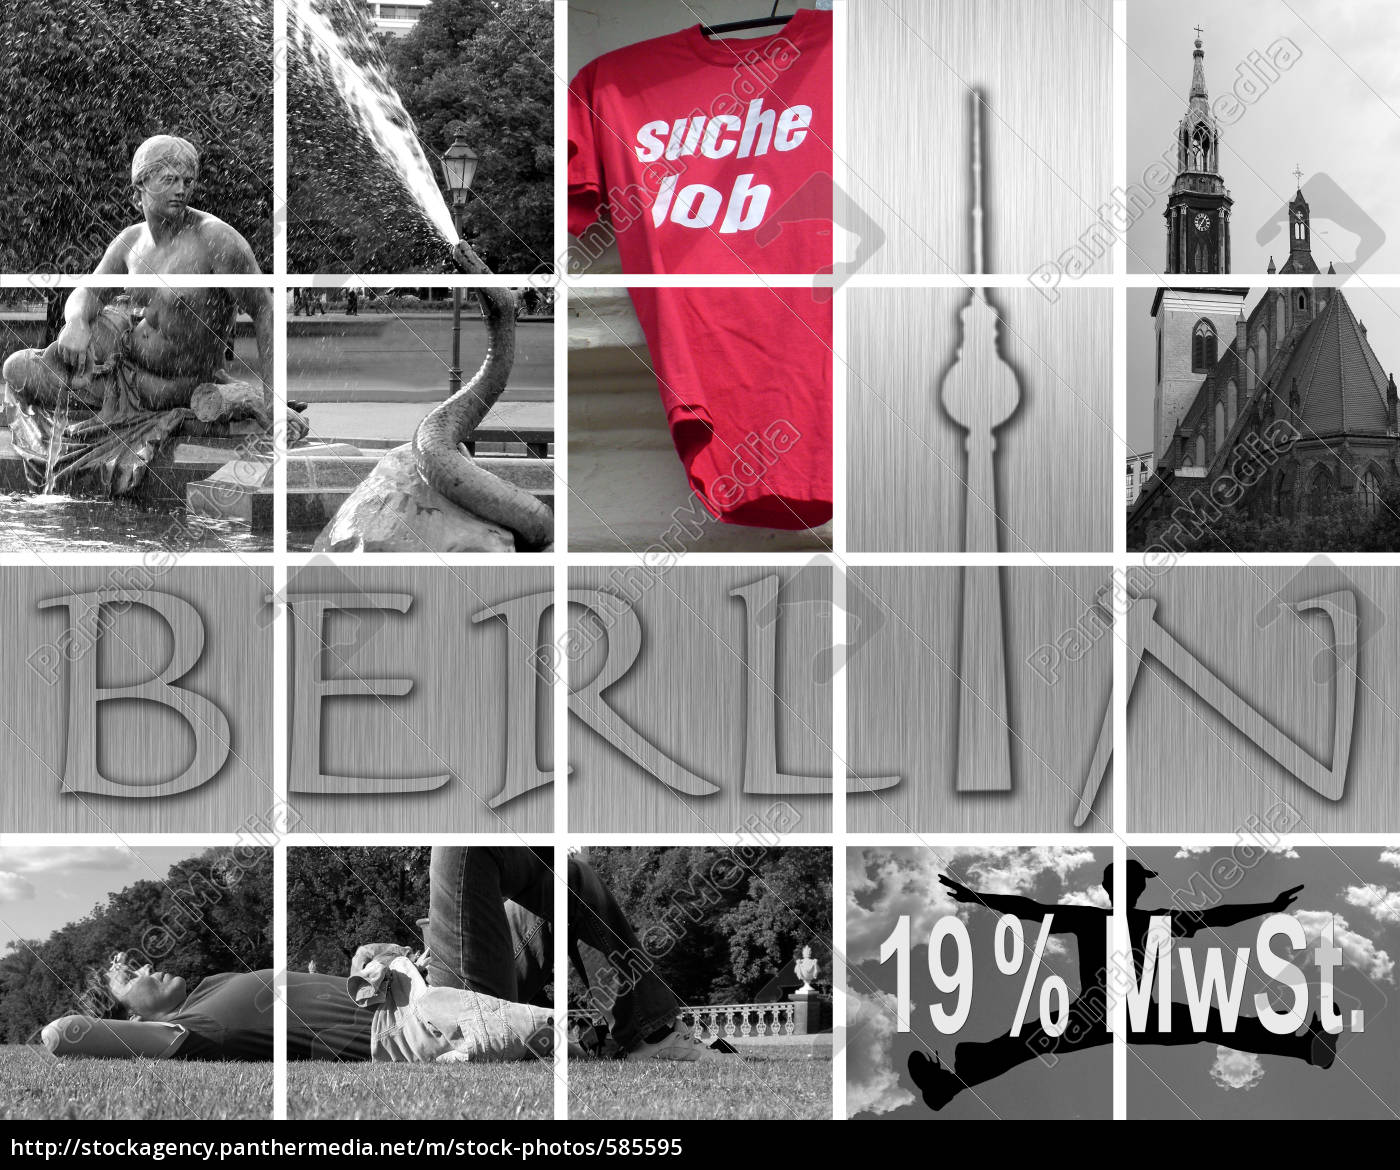 berlin, -, politics, and, social, affairs - 585595